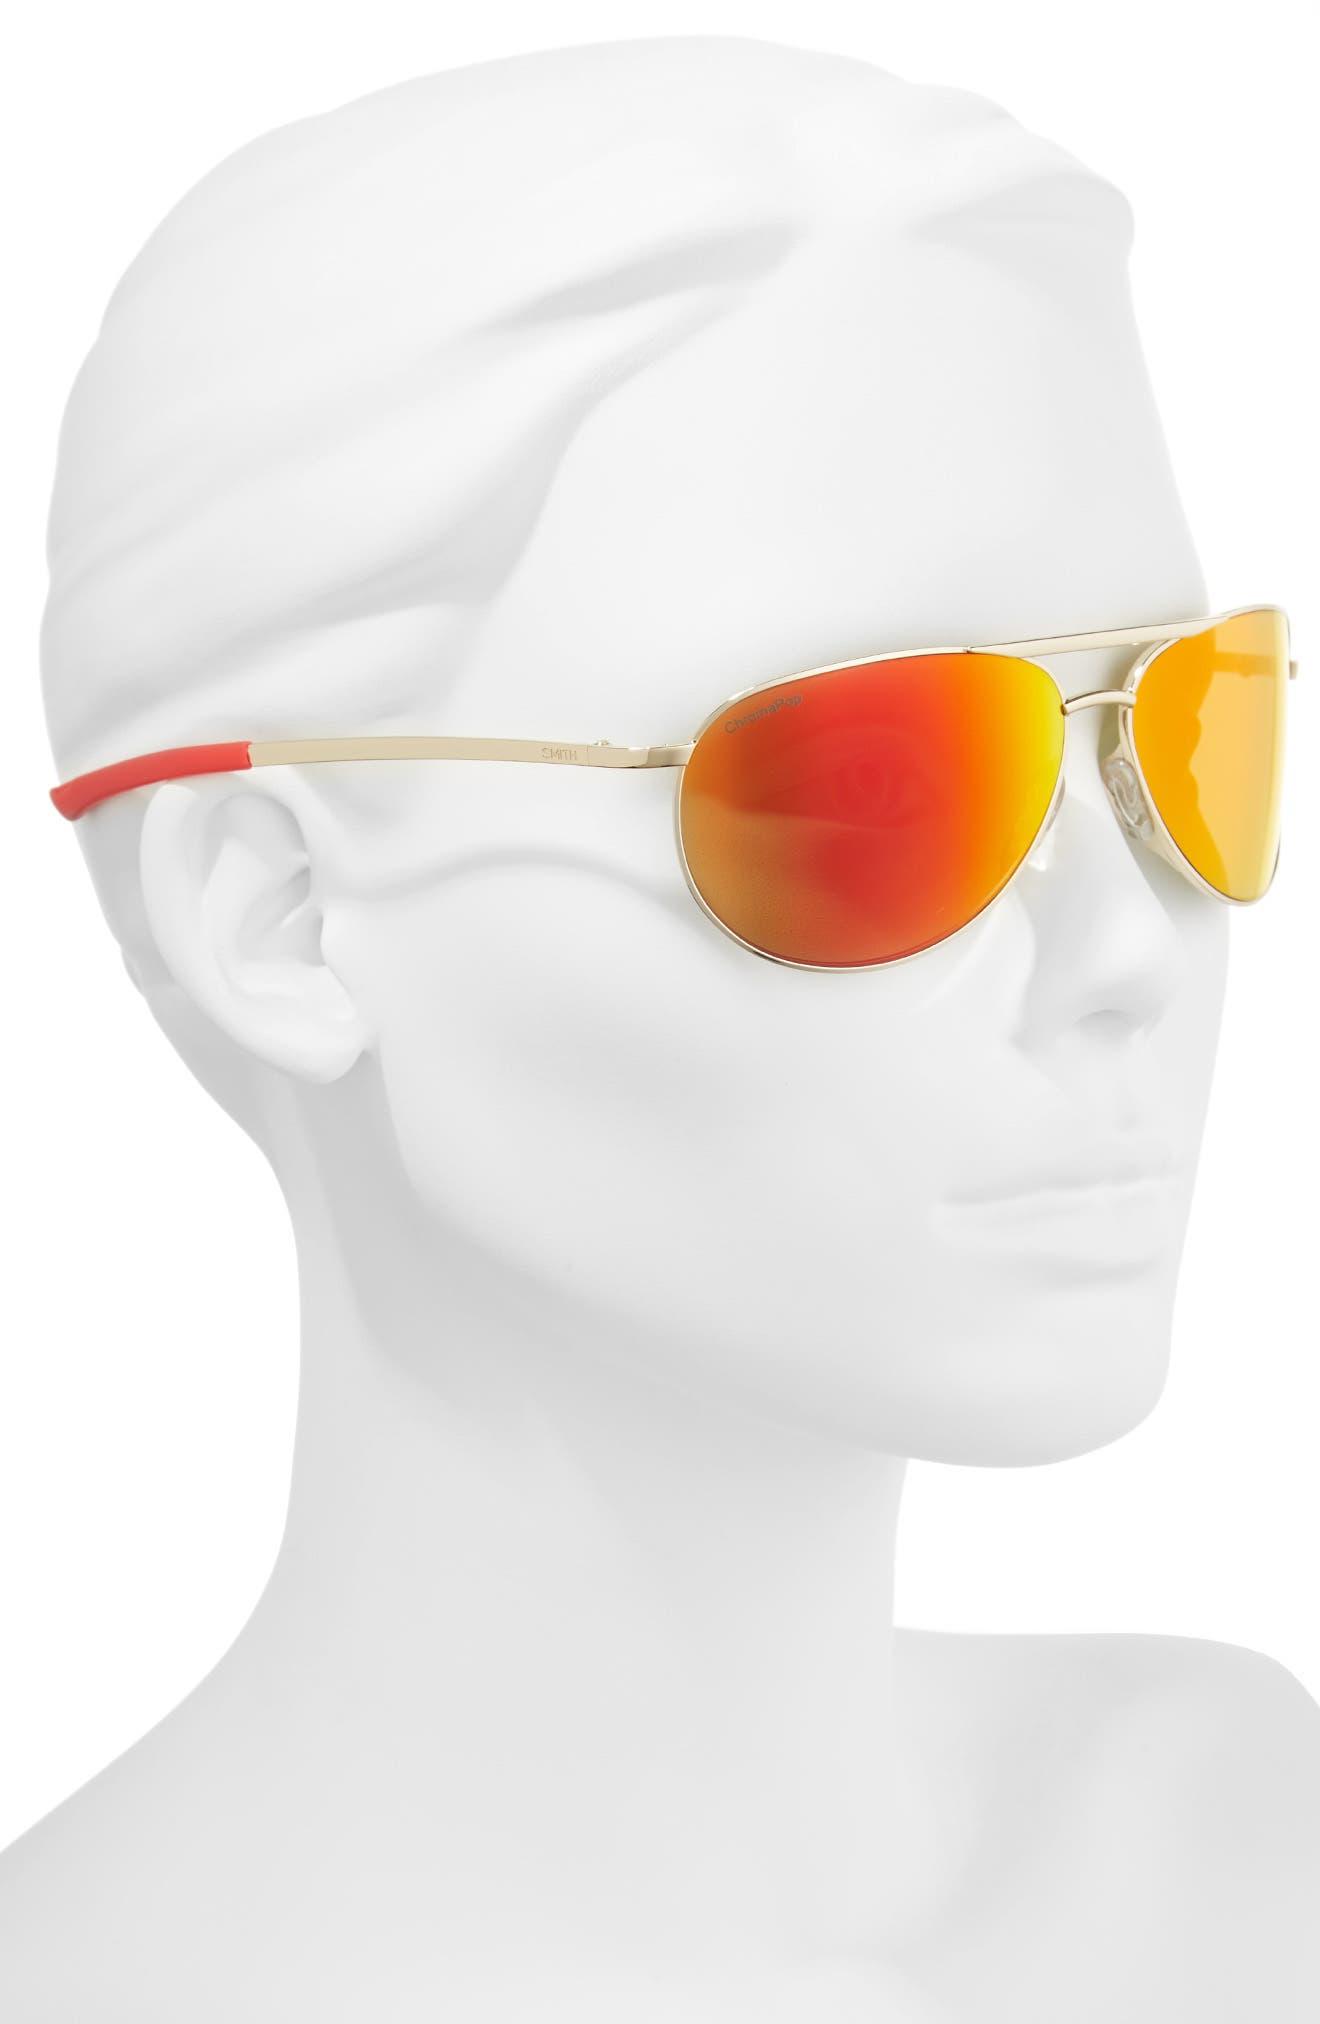 Serpico Slim 2.0 60mm ChromaPop Polarized Aviator Sunglasses,                             Alternate thumbnail 2, color,                             710